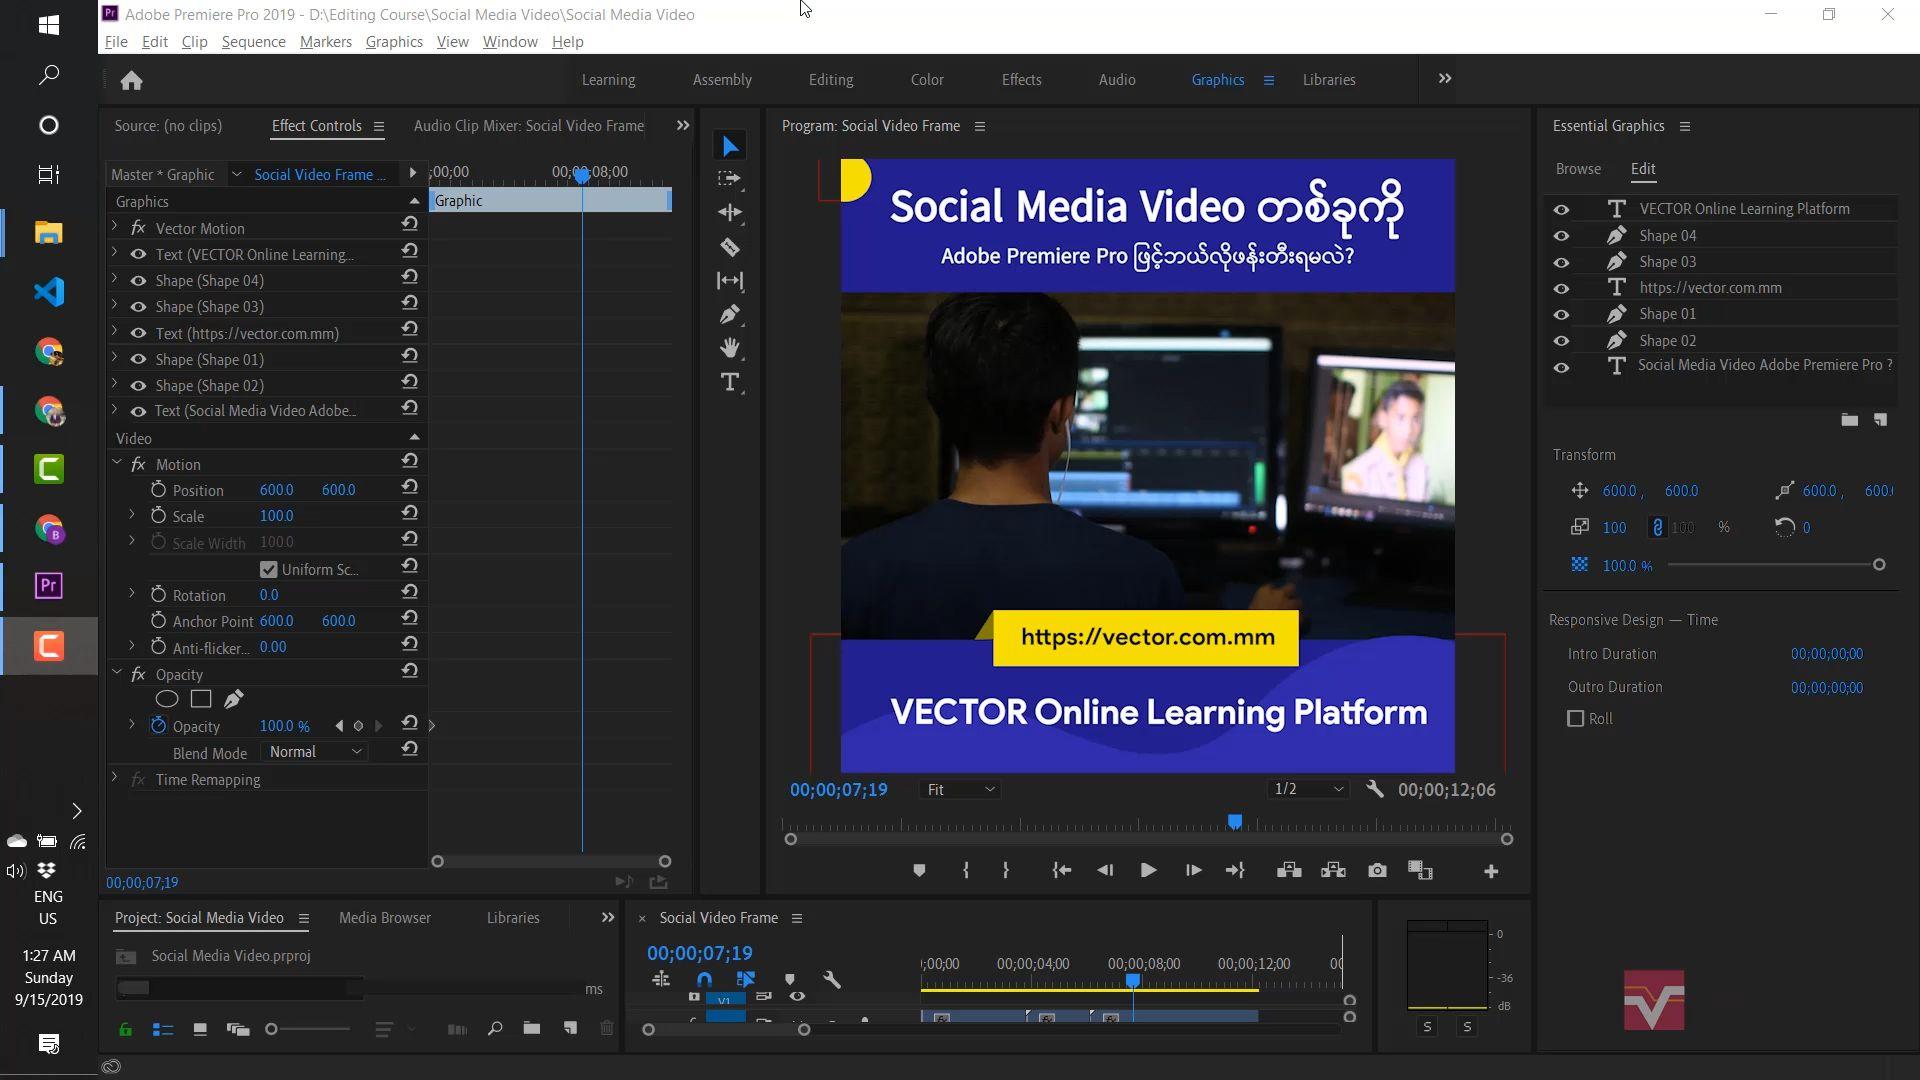 How to create a Social Media Video (Bonus)